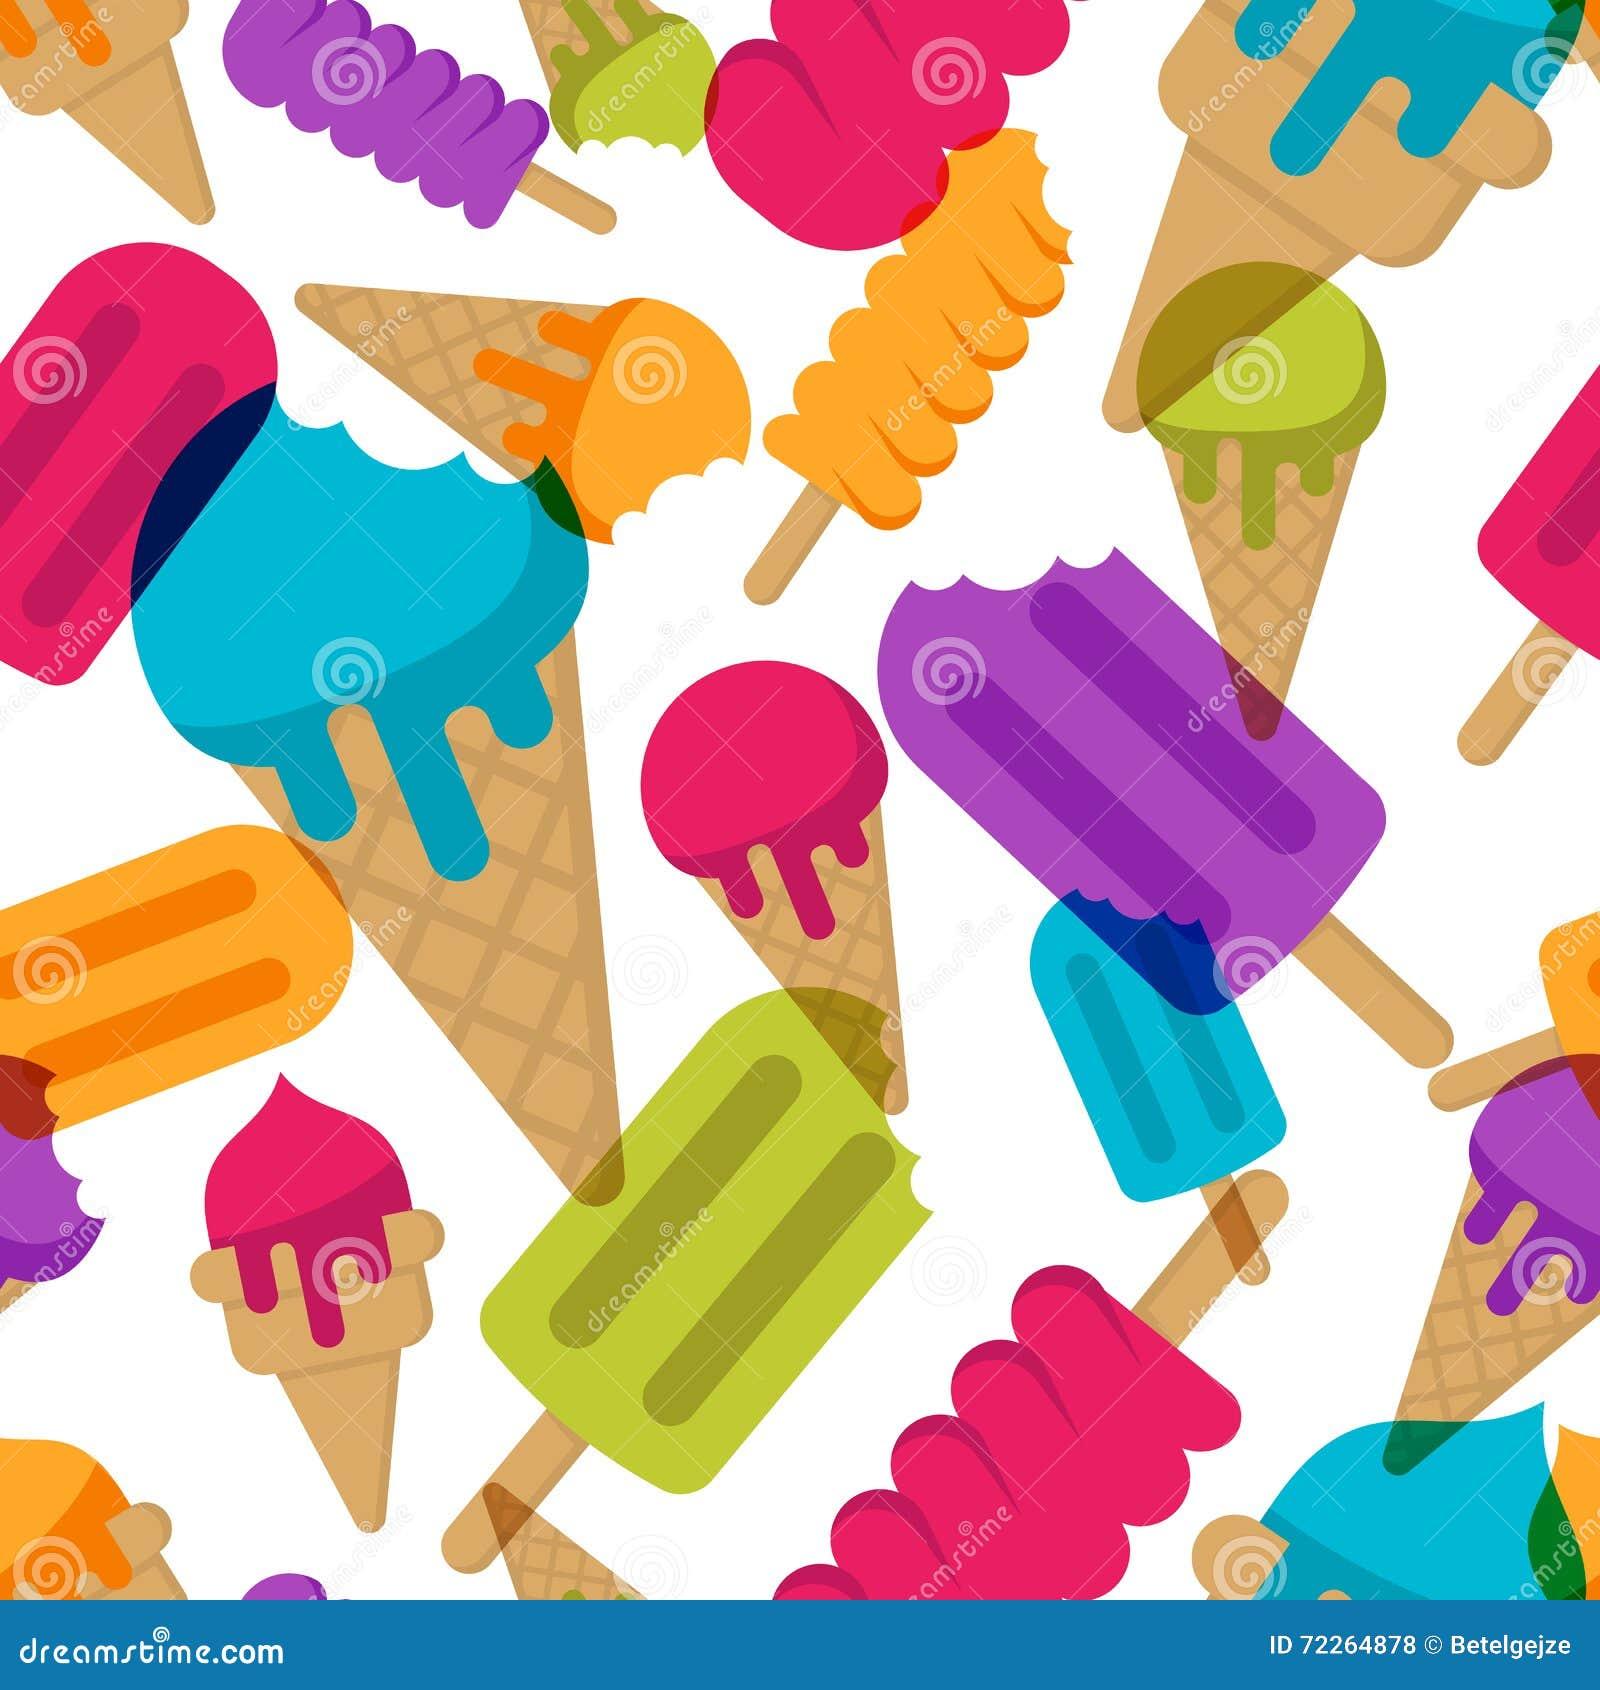 Summer Ice Cream Wallpaper: Vector Seamless Summer Pattern With Multicolor Ice Cream